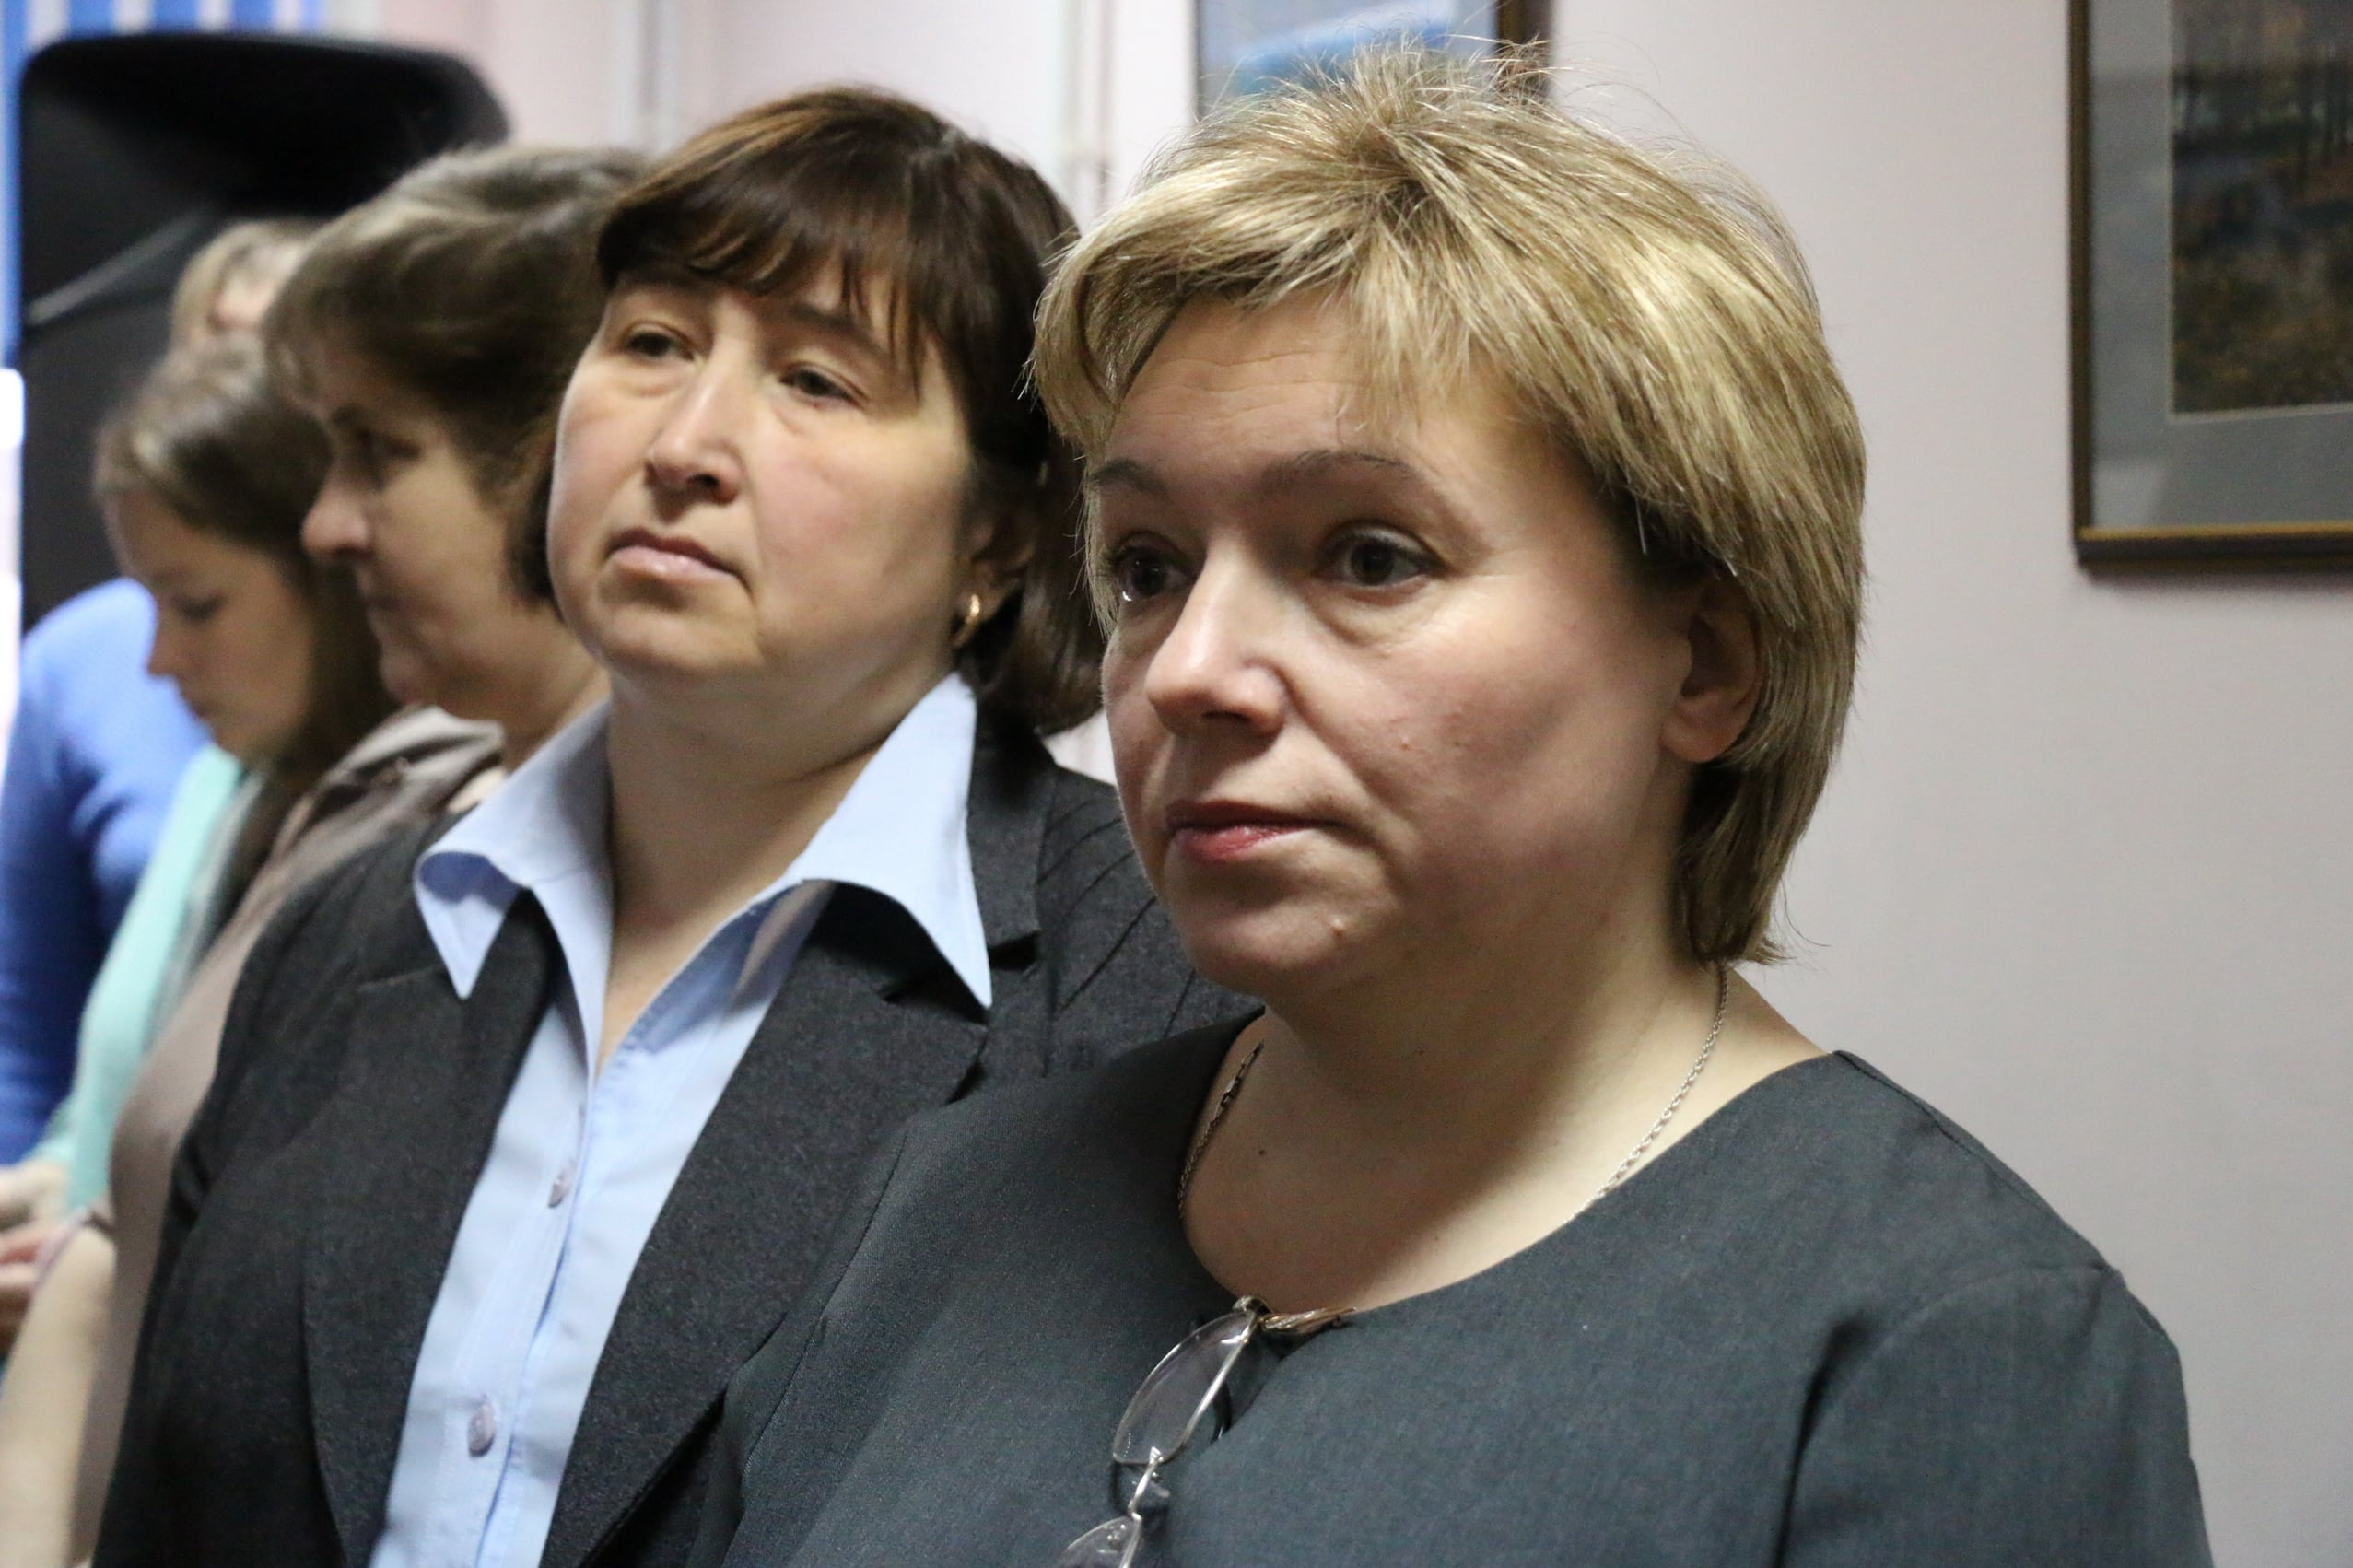 http://monuspen.ru/photoreports/06f1f0951a3799a9c804c7f0881a7669.JPG